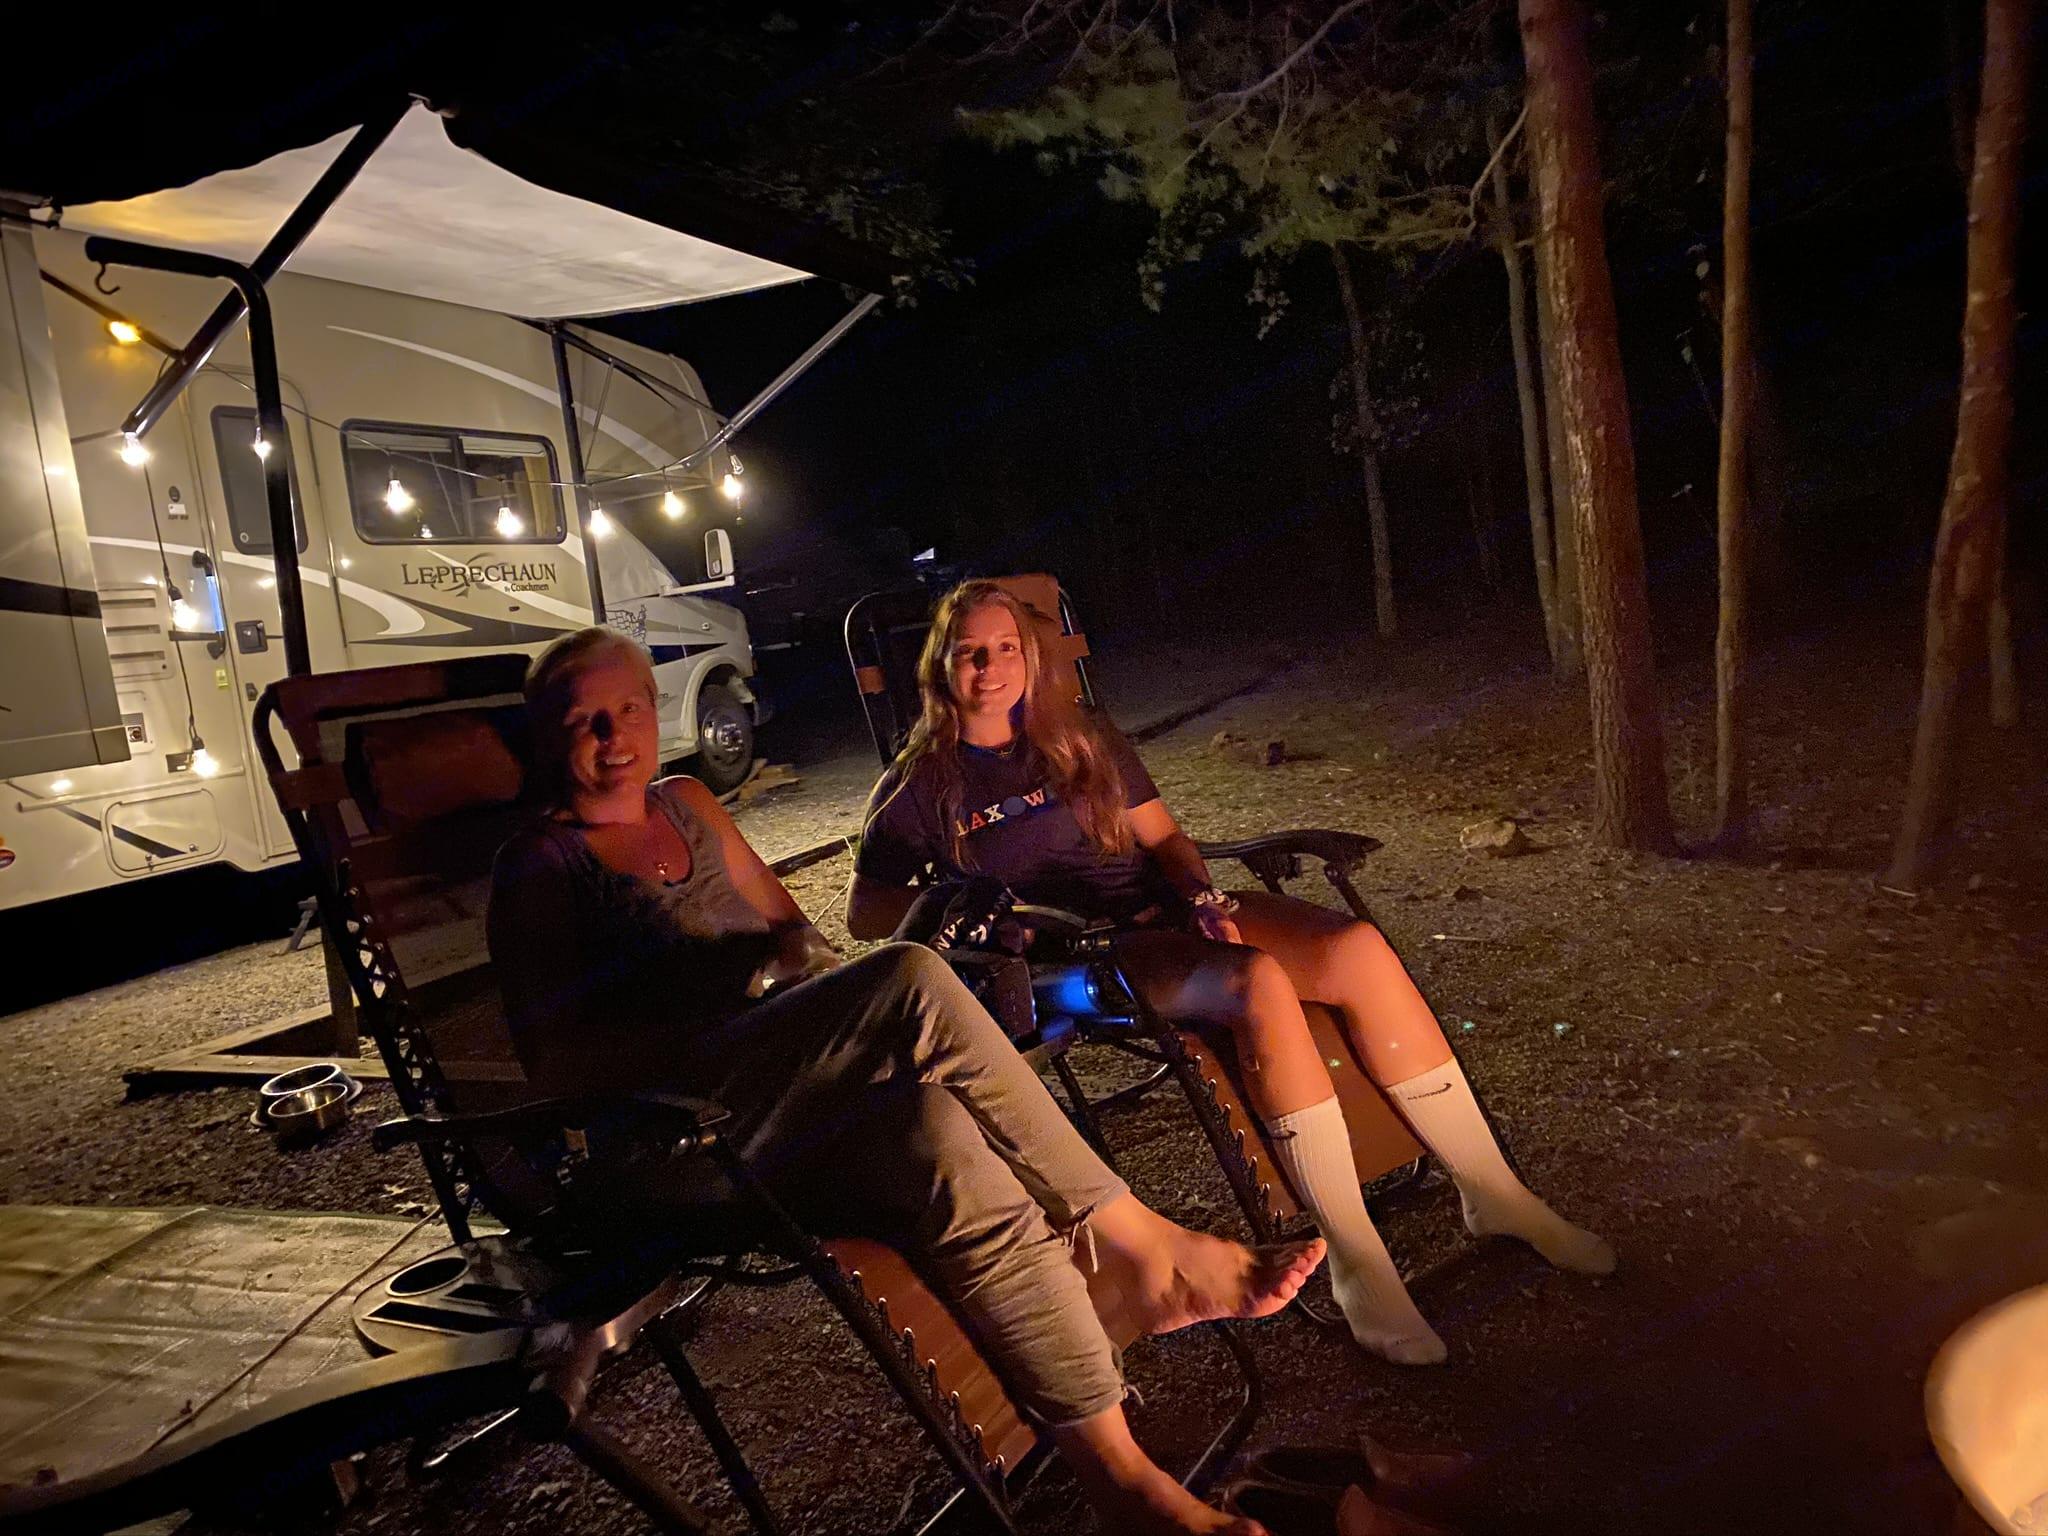 Relaxing by the campfire. Coachmen Leprechaun 2014